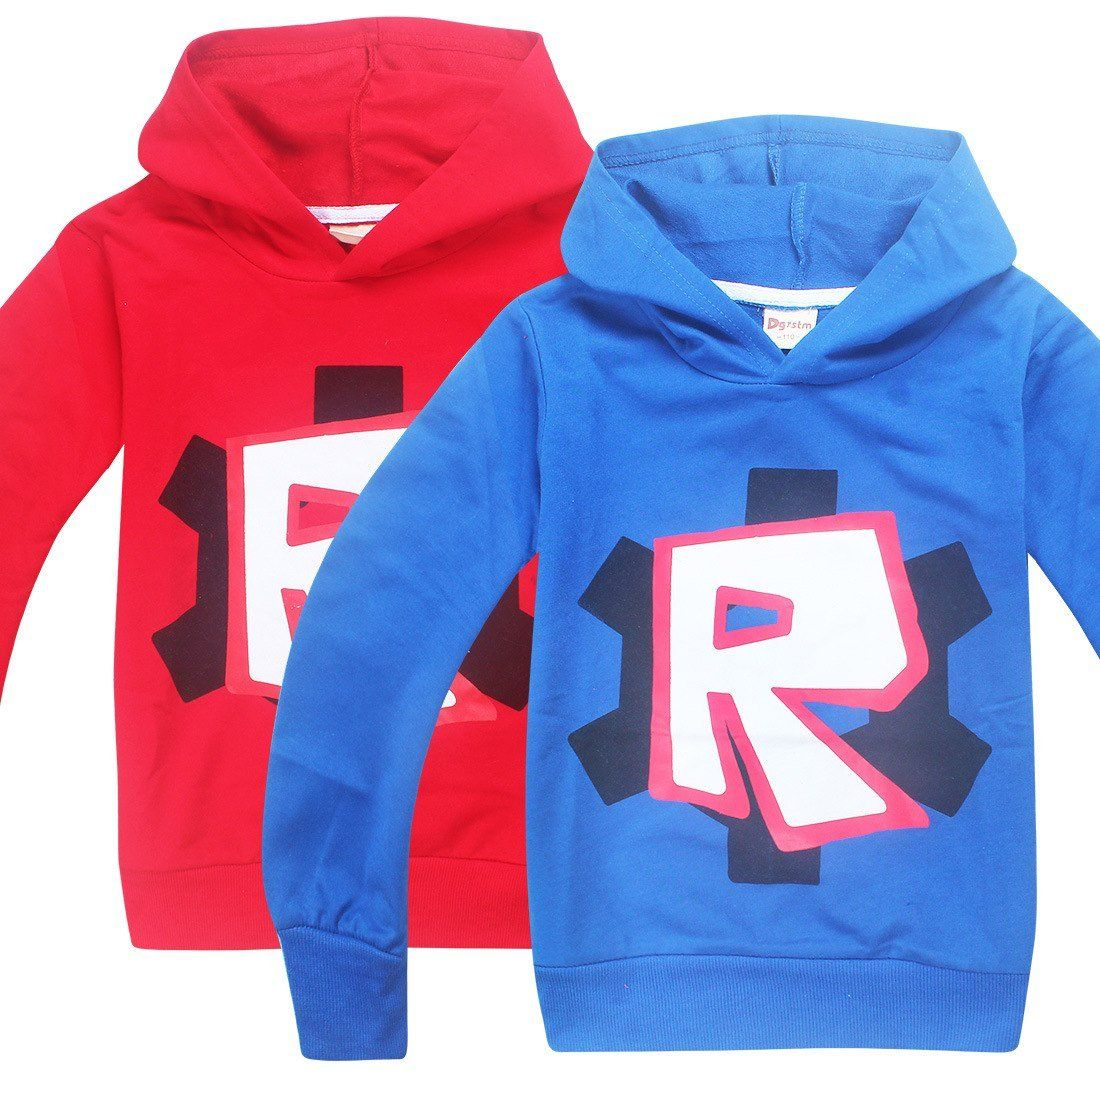 5, Pink Boys Girls Kids Roblox Cotton Hooded Long Sleeve Shirts